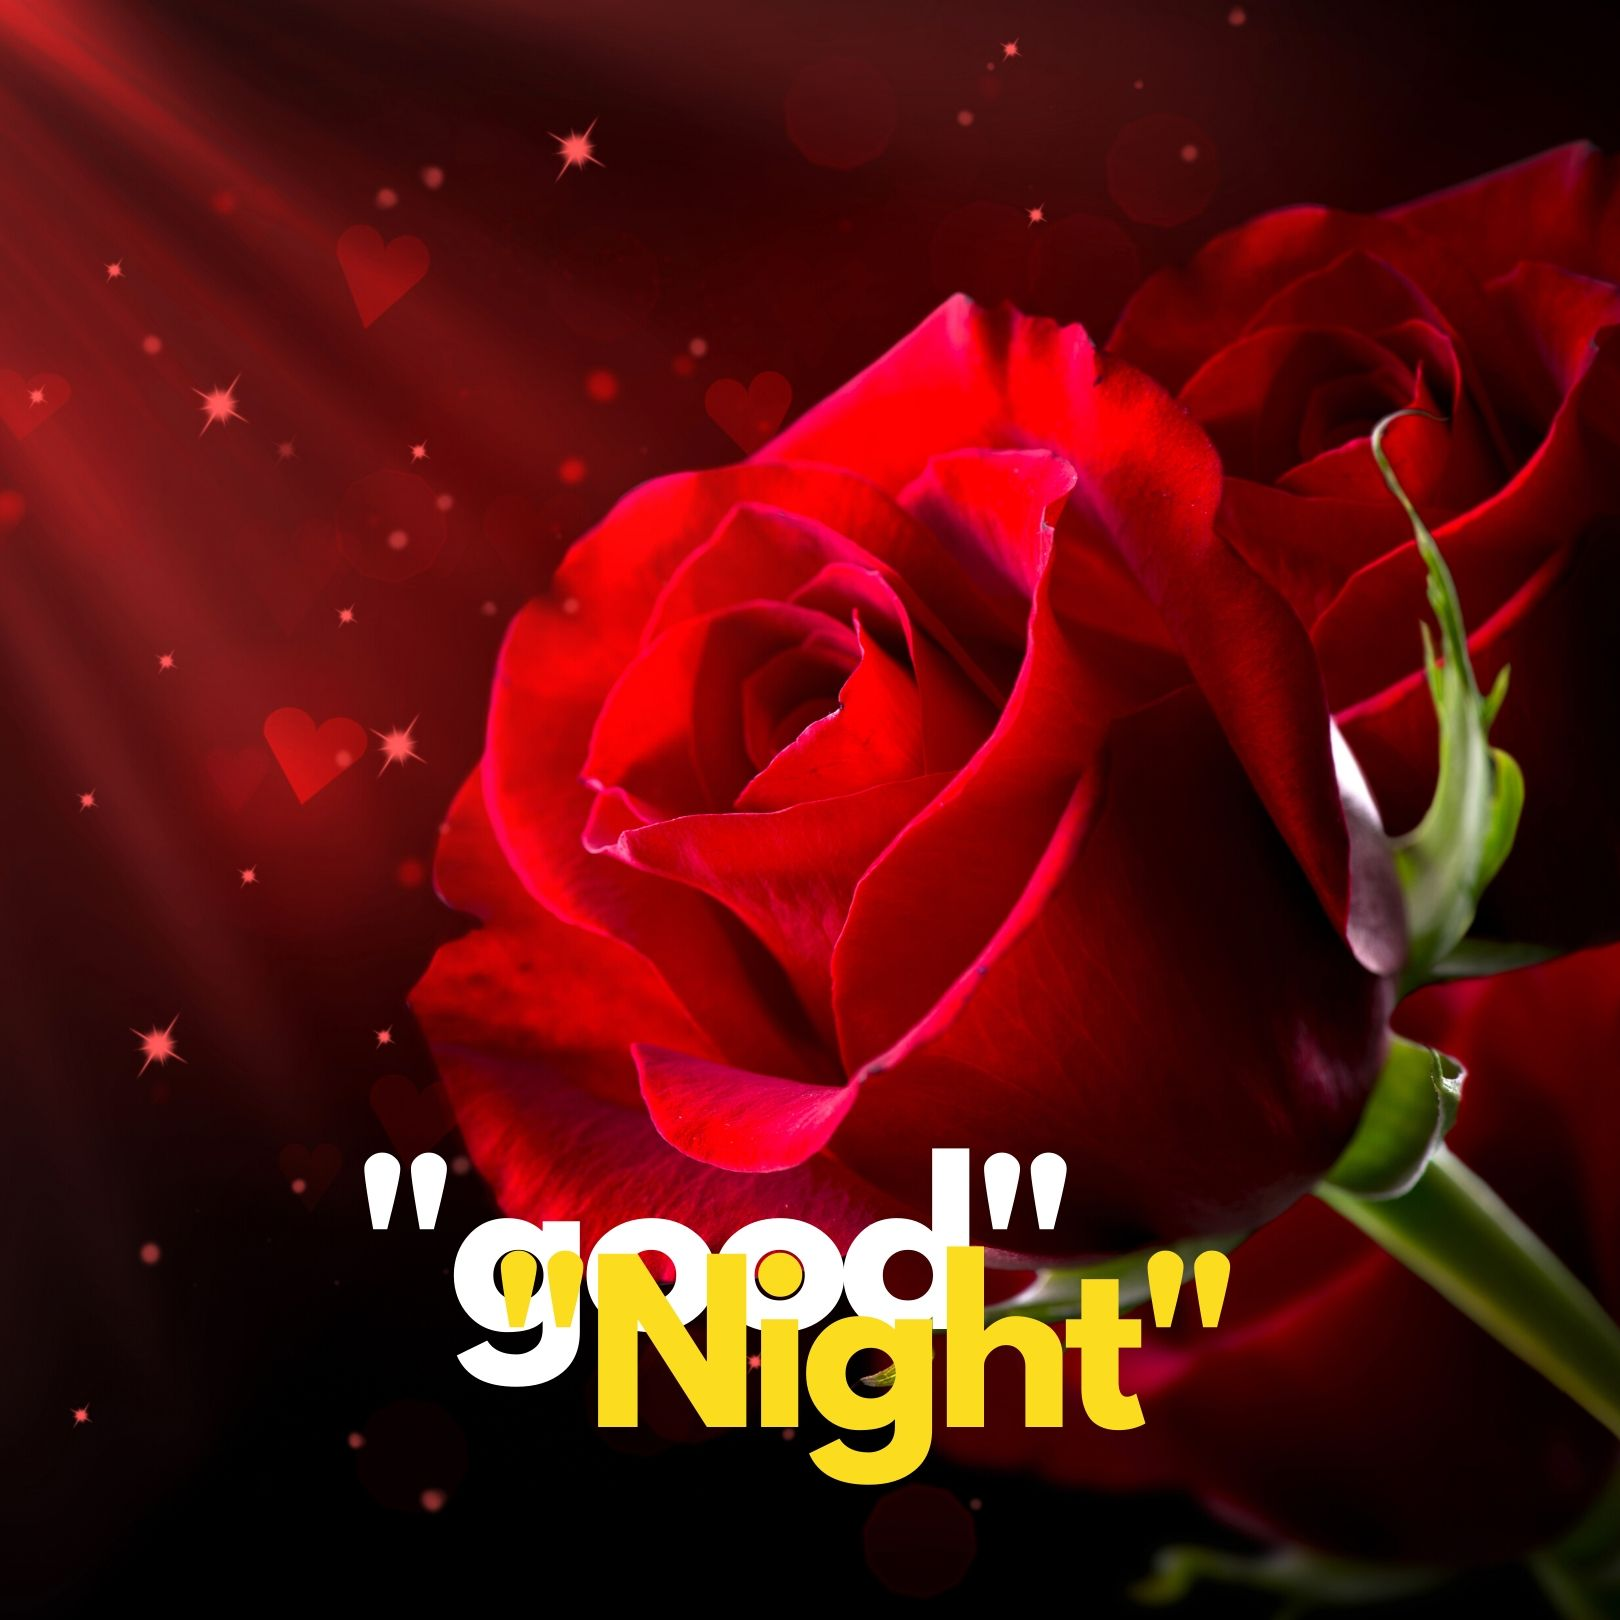 Good Night rose pic hd